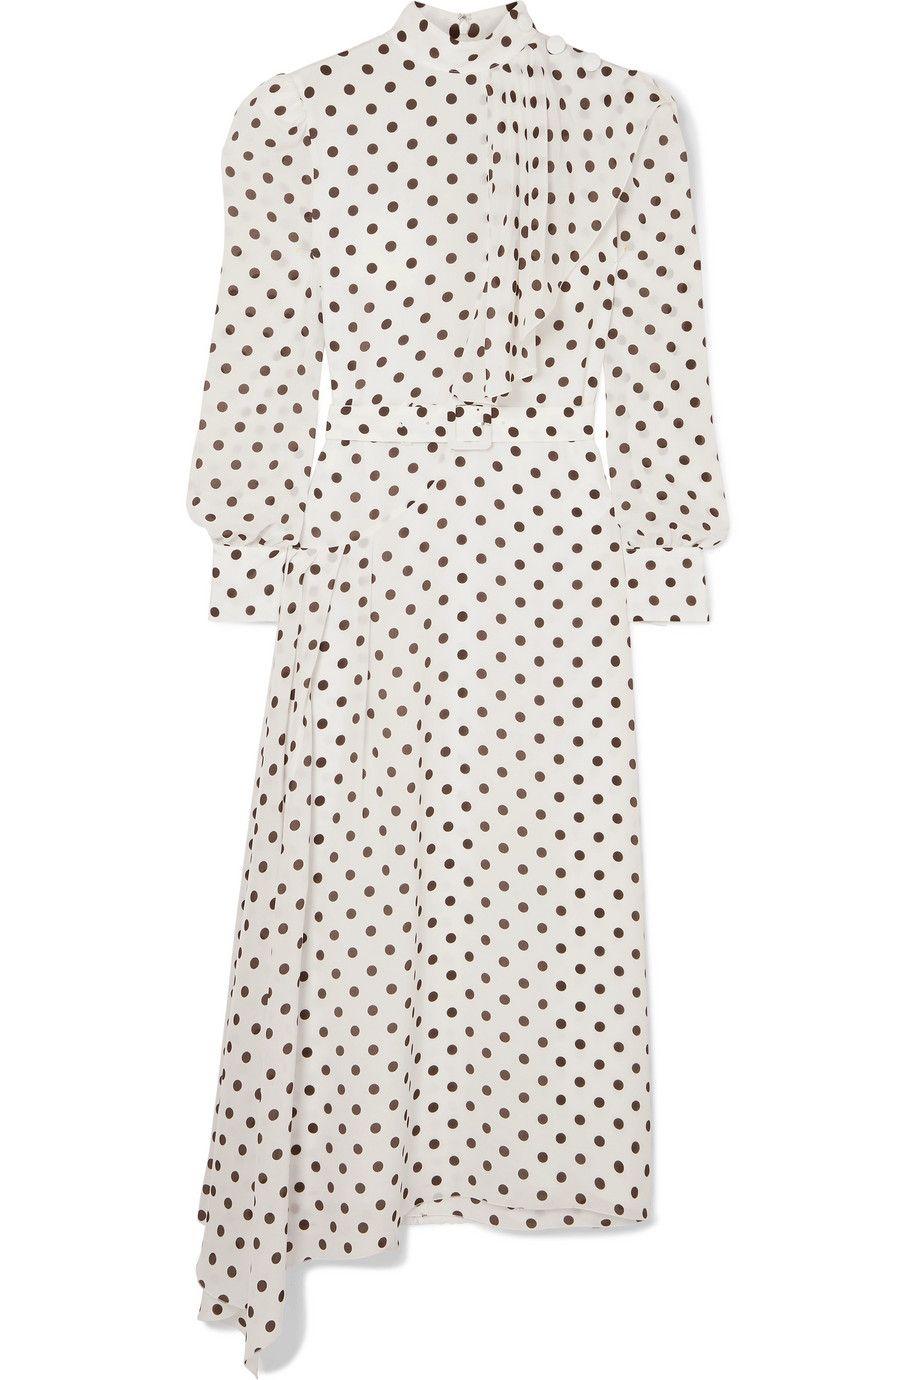 Alessandra Rich polka dot dress net a porter